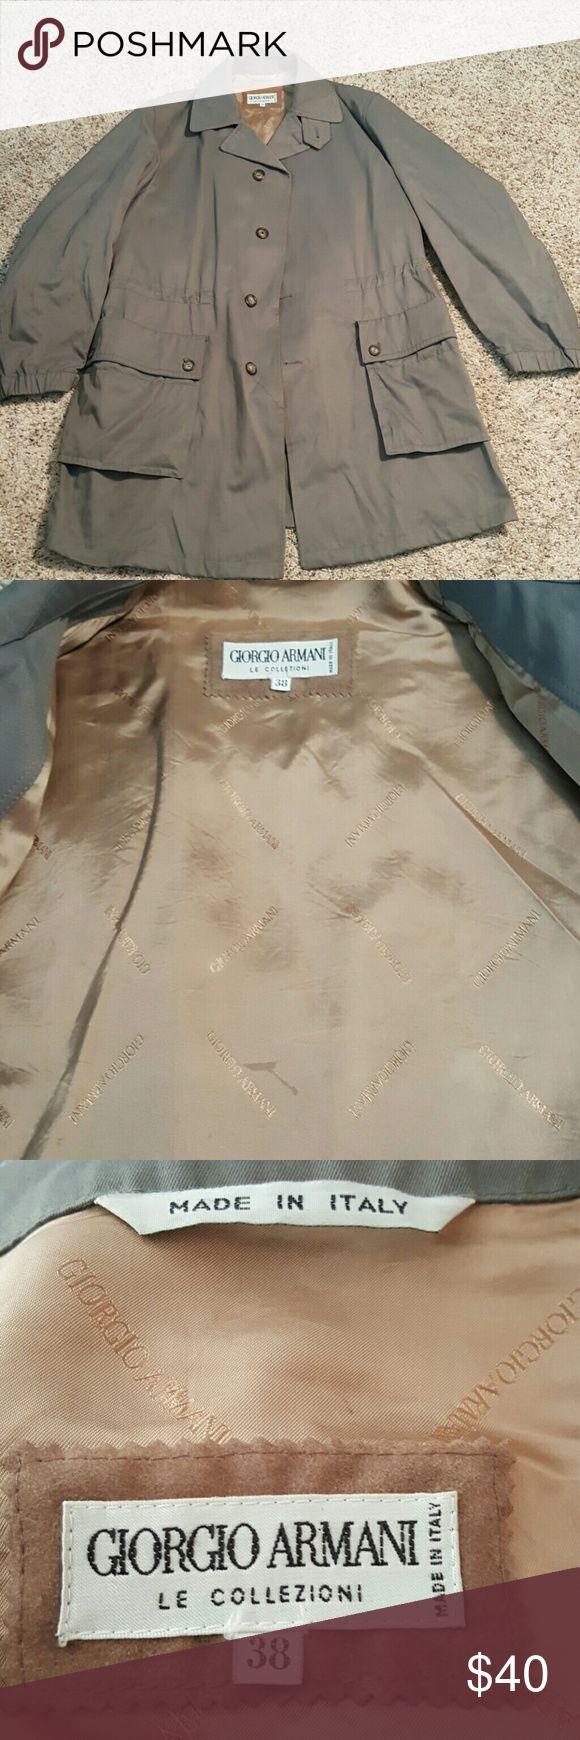 Giorgio Armani Jacket size 38 LE Collection made in ITALY Giorgio Armani Jackets & Coats Lightweight & Shirt Jackets